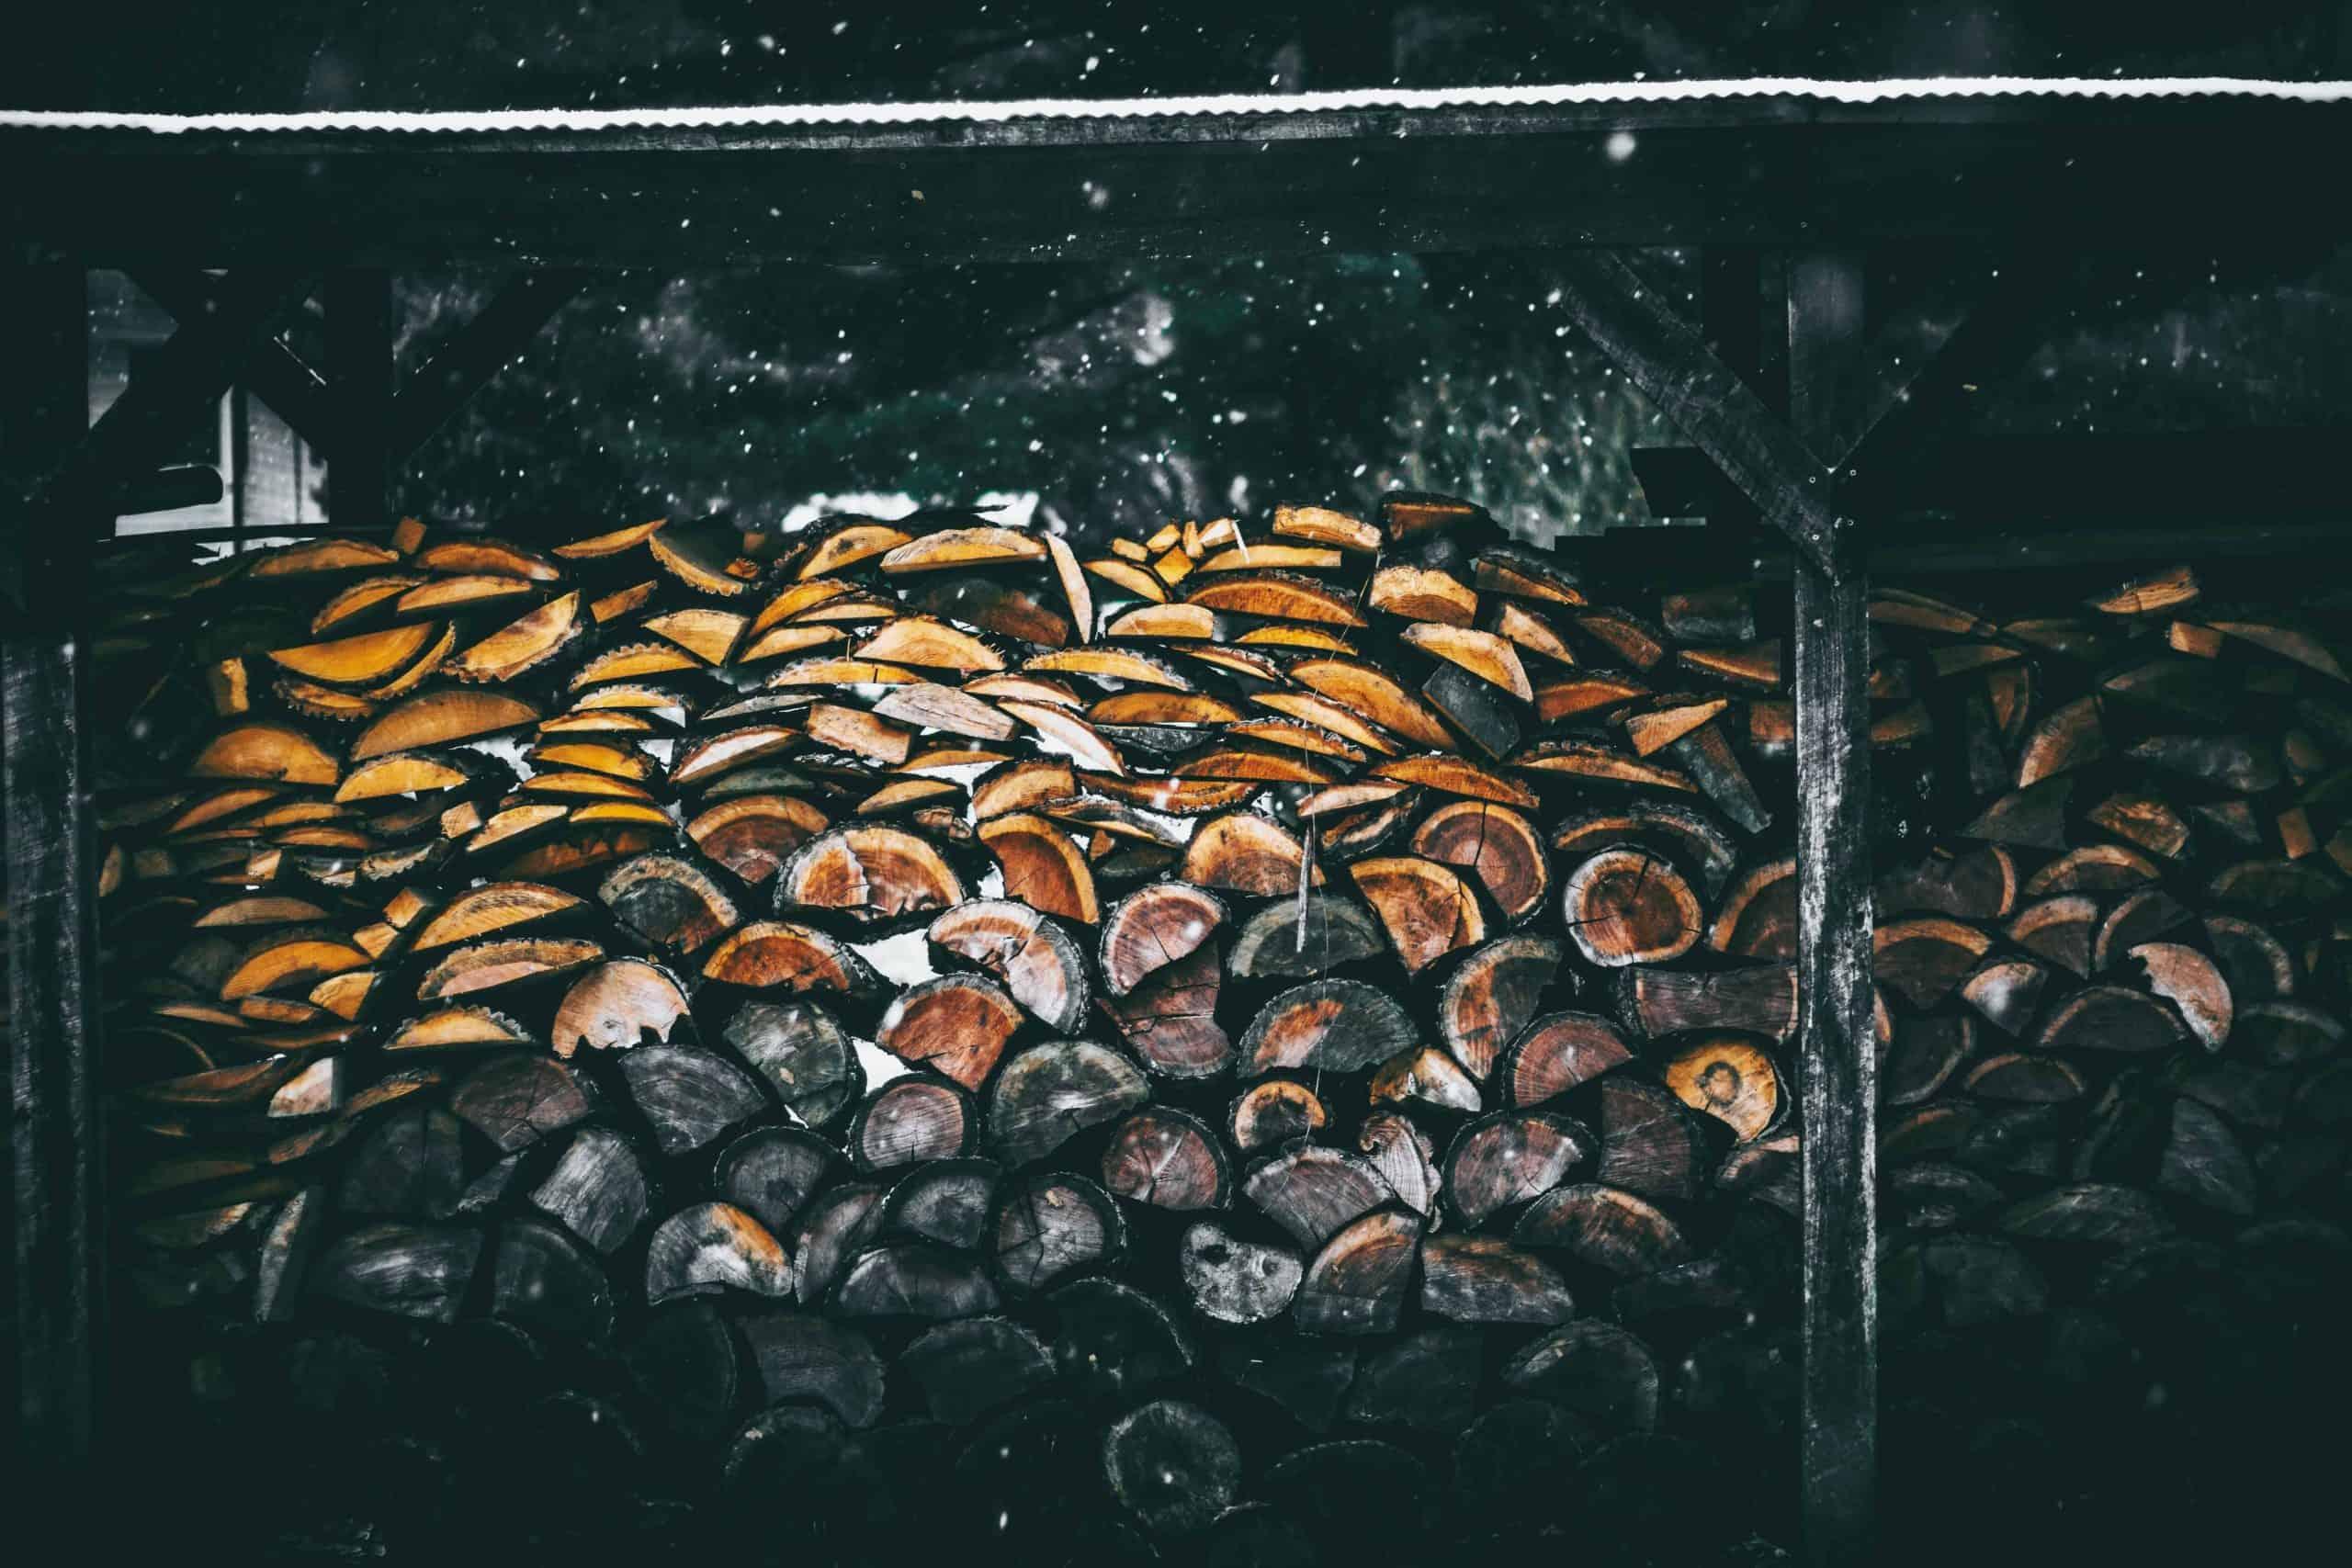 Disposing of Pressure Treated Wood